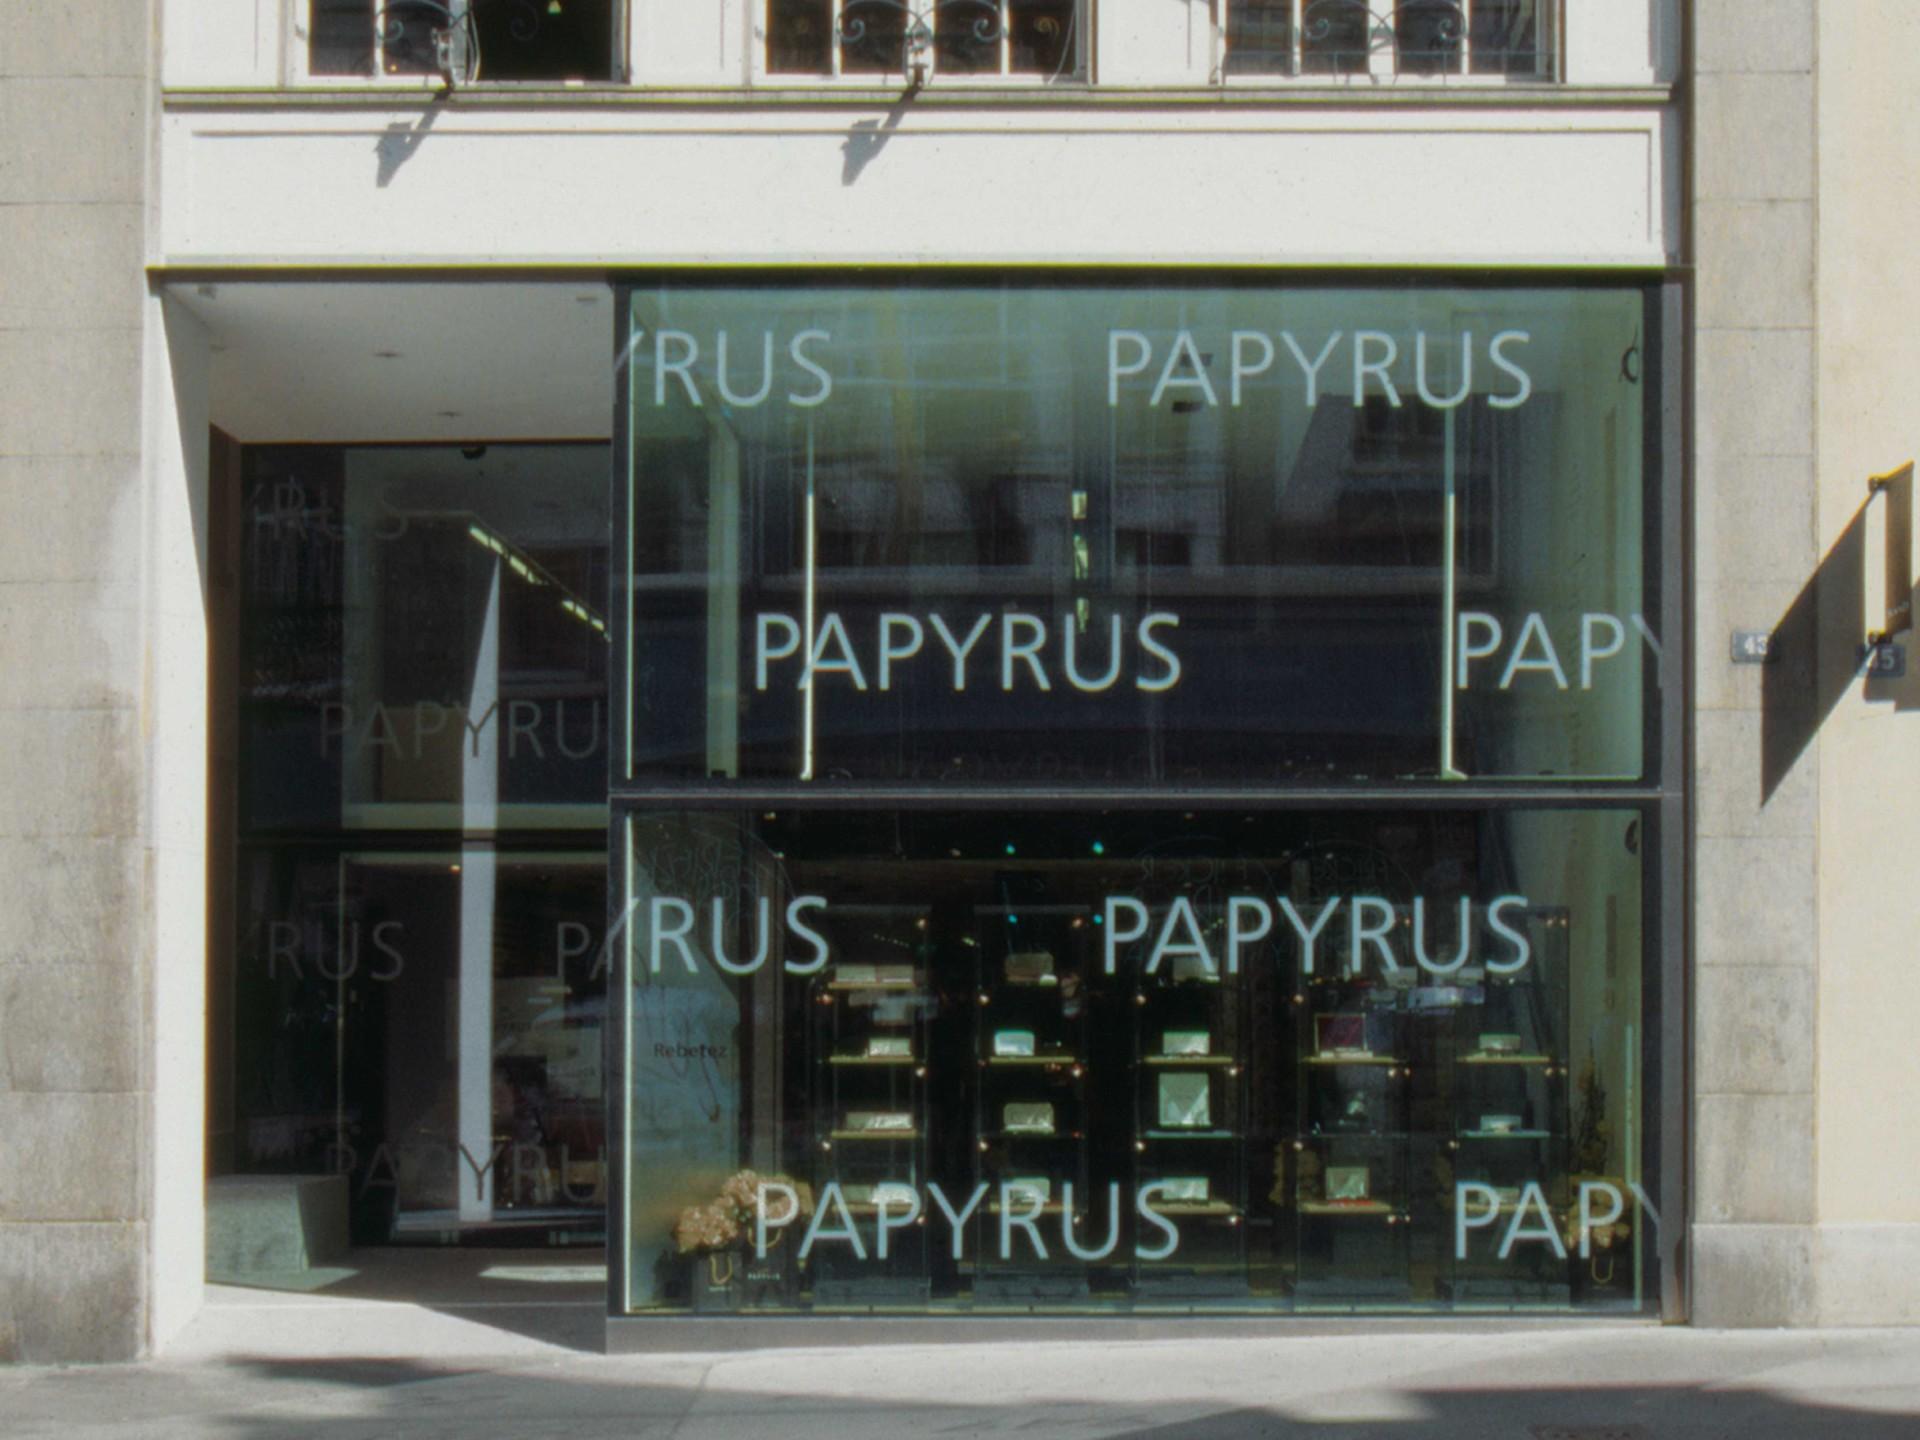 BKVK Papyrus — Hausbeschriftung